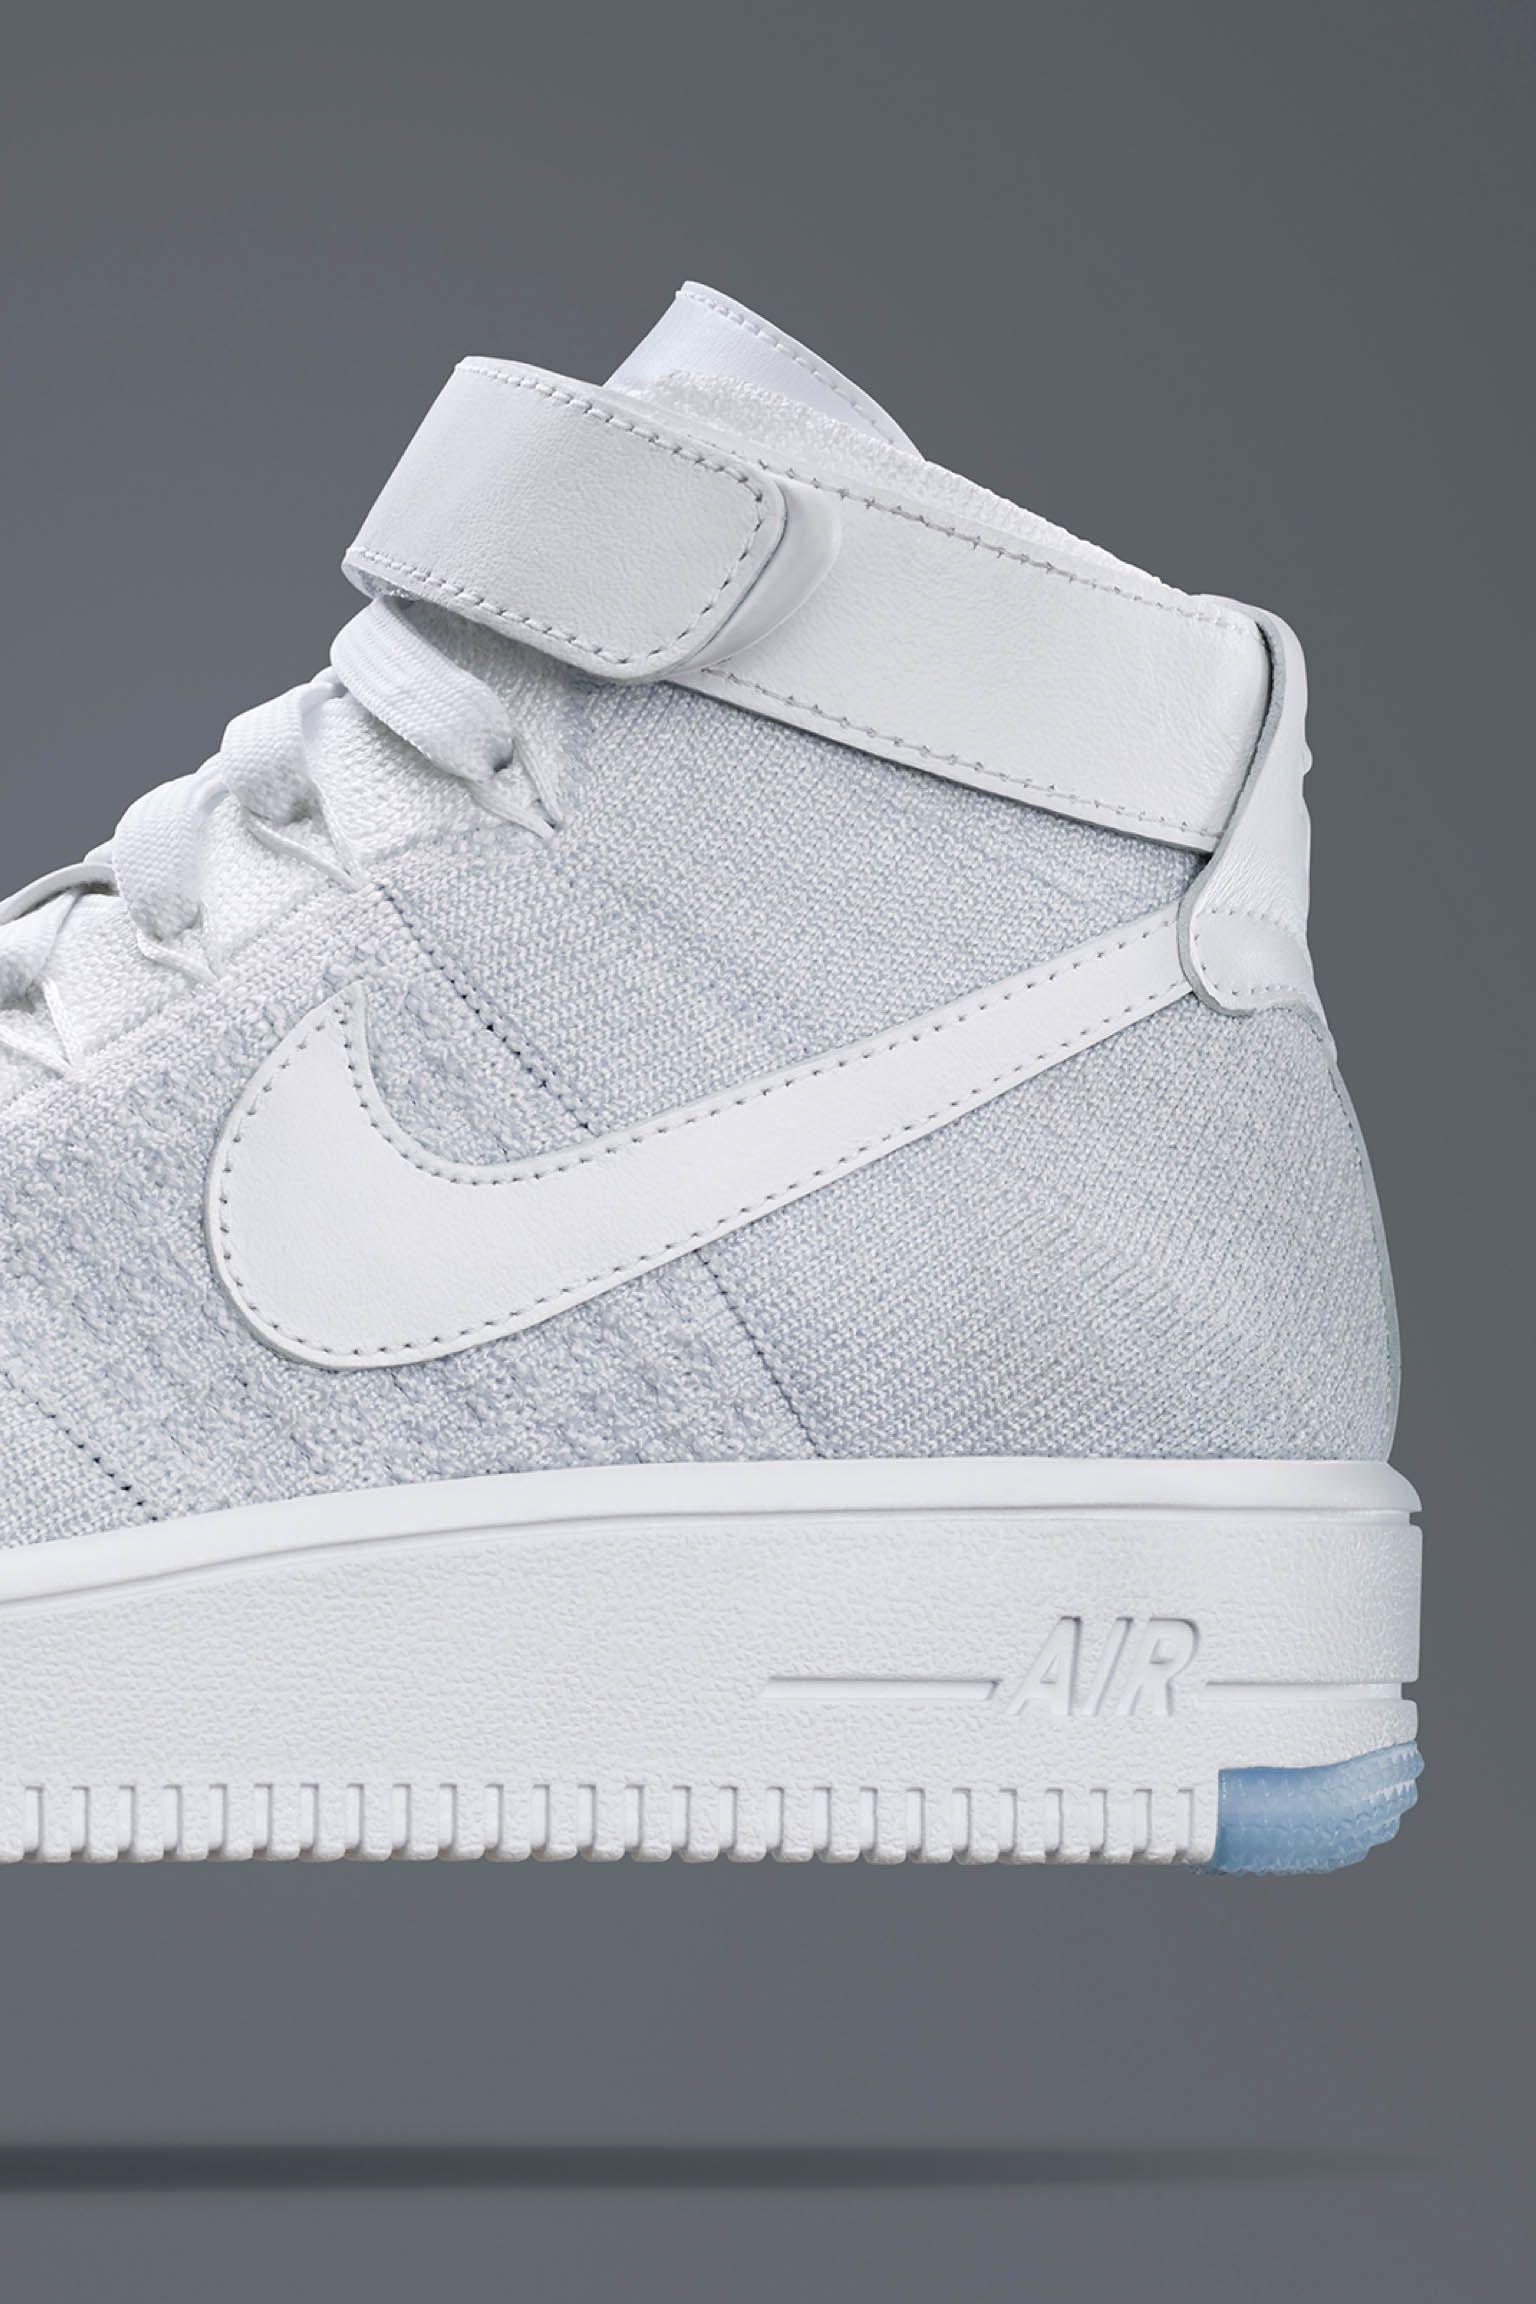 Women's Nike Air Force 1 Ultra Flyknit 'White Ice' Release Date